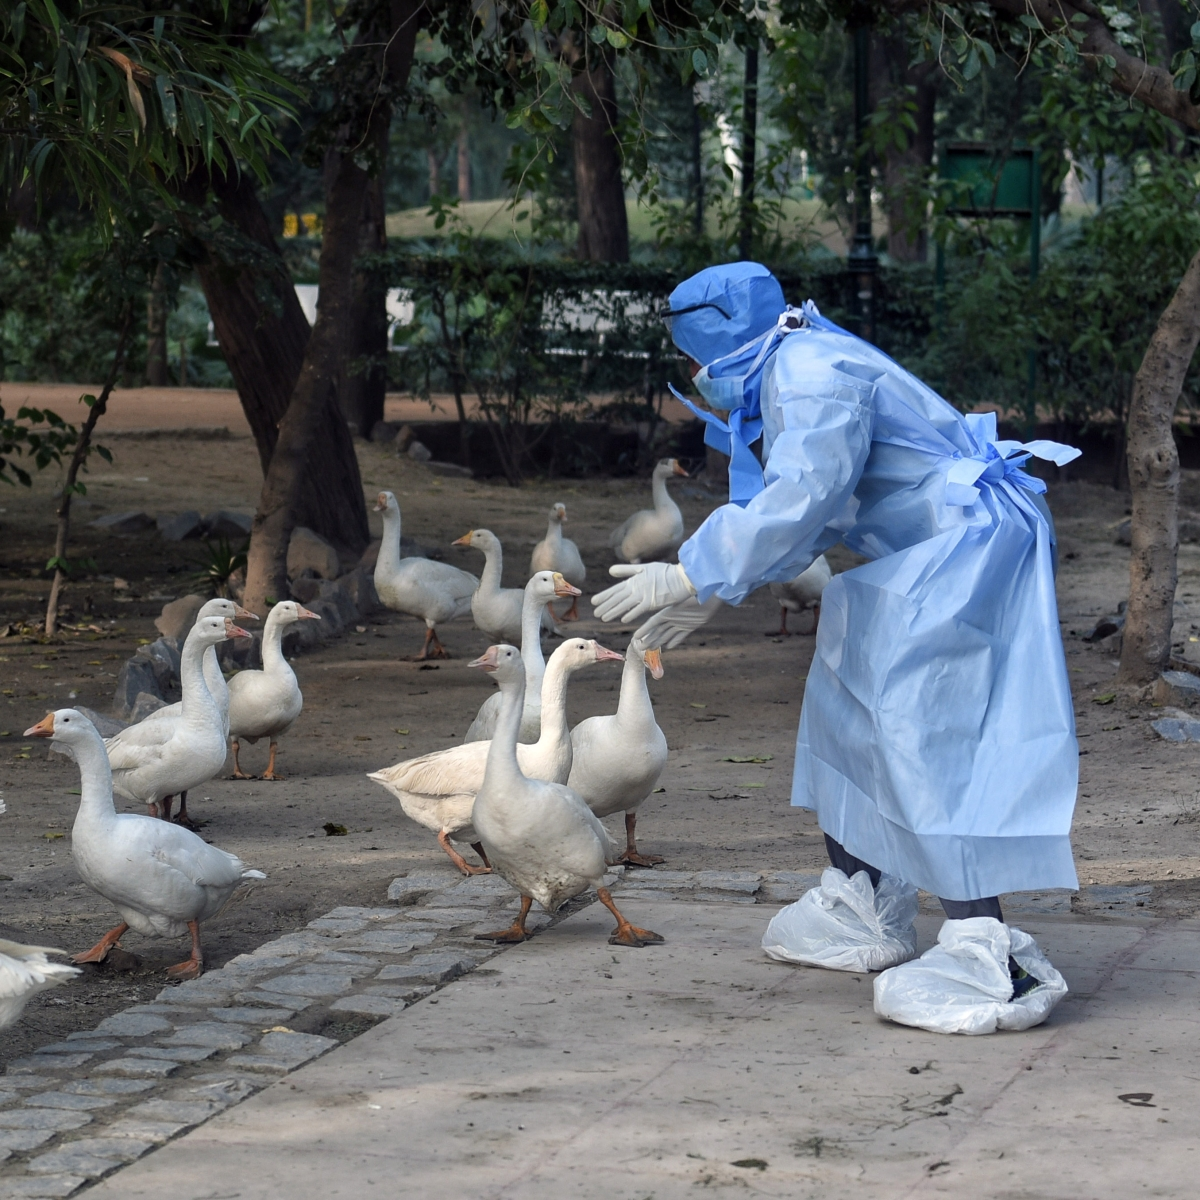 Shiv Sena slams BJP over bird flu, asks if Pak, Khalistanis behind outbreak